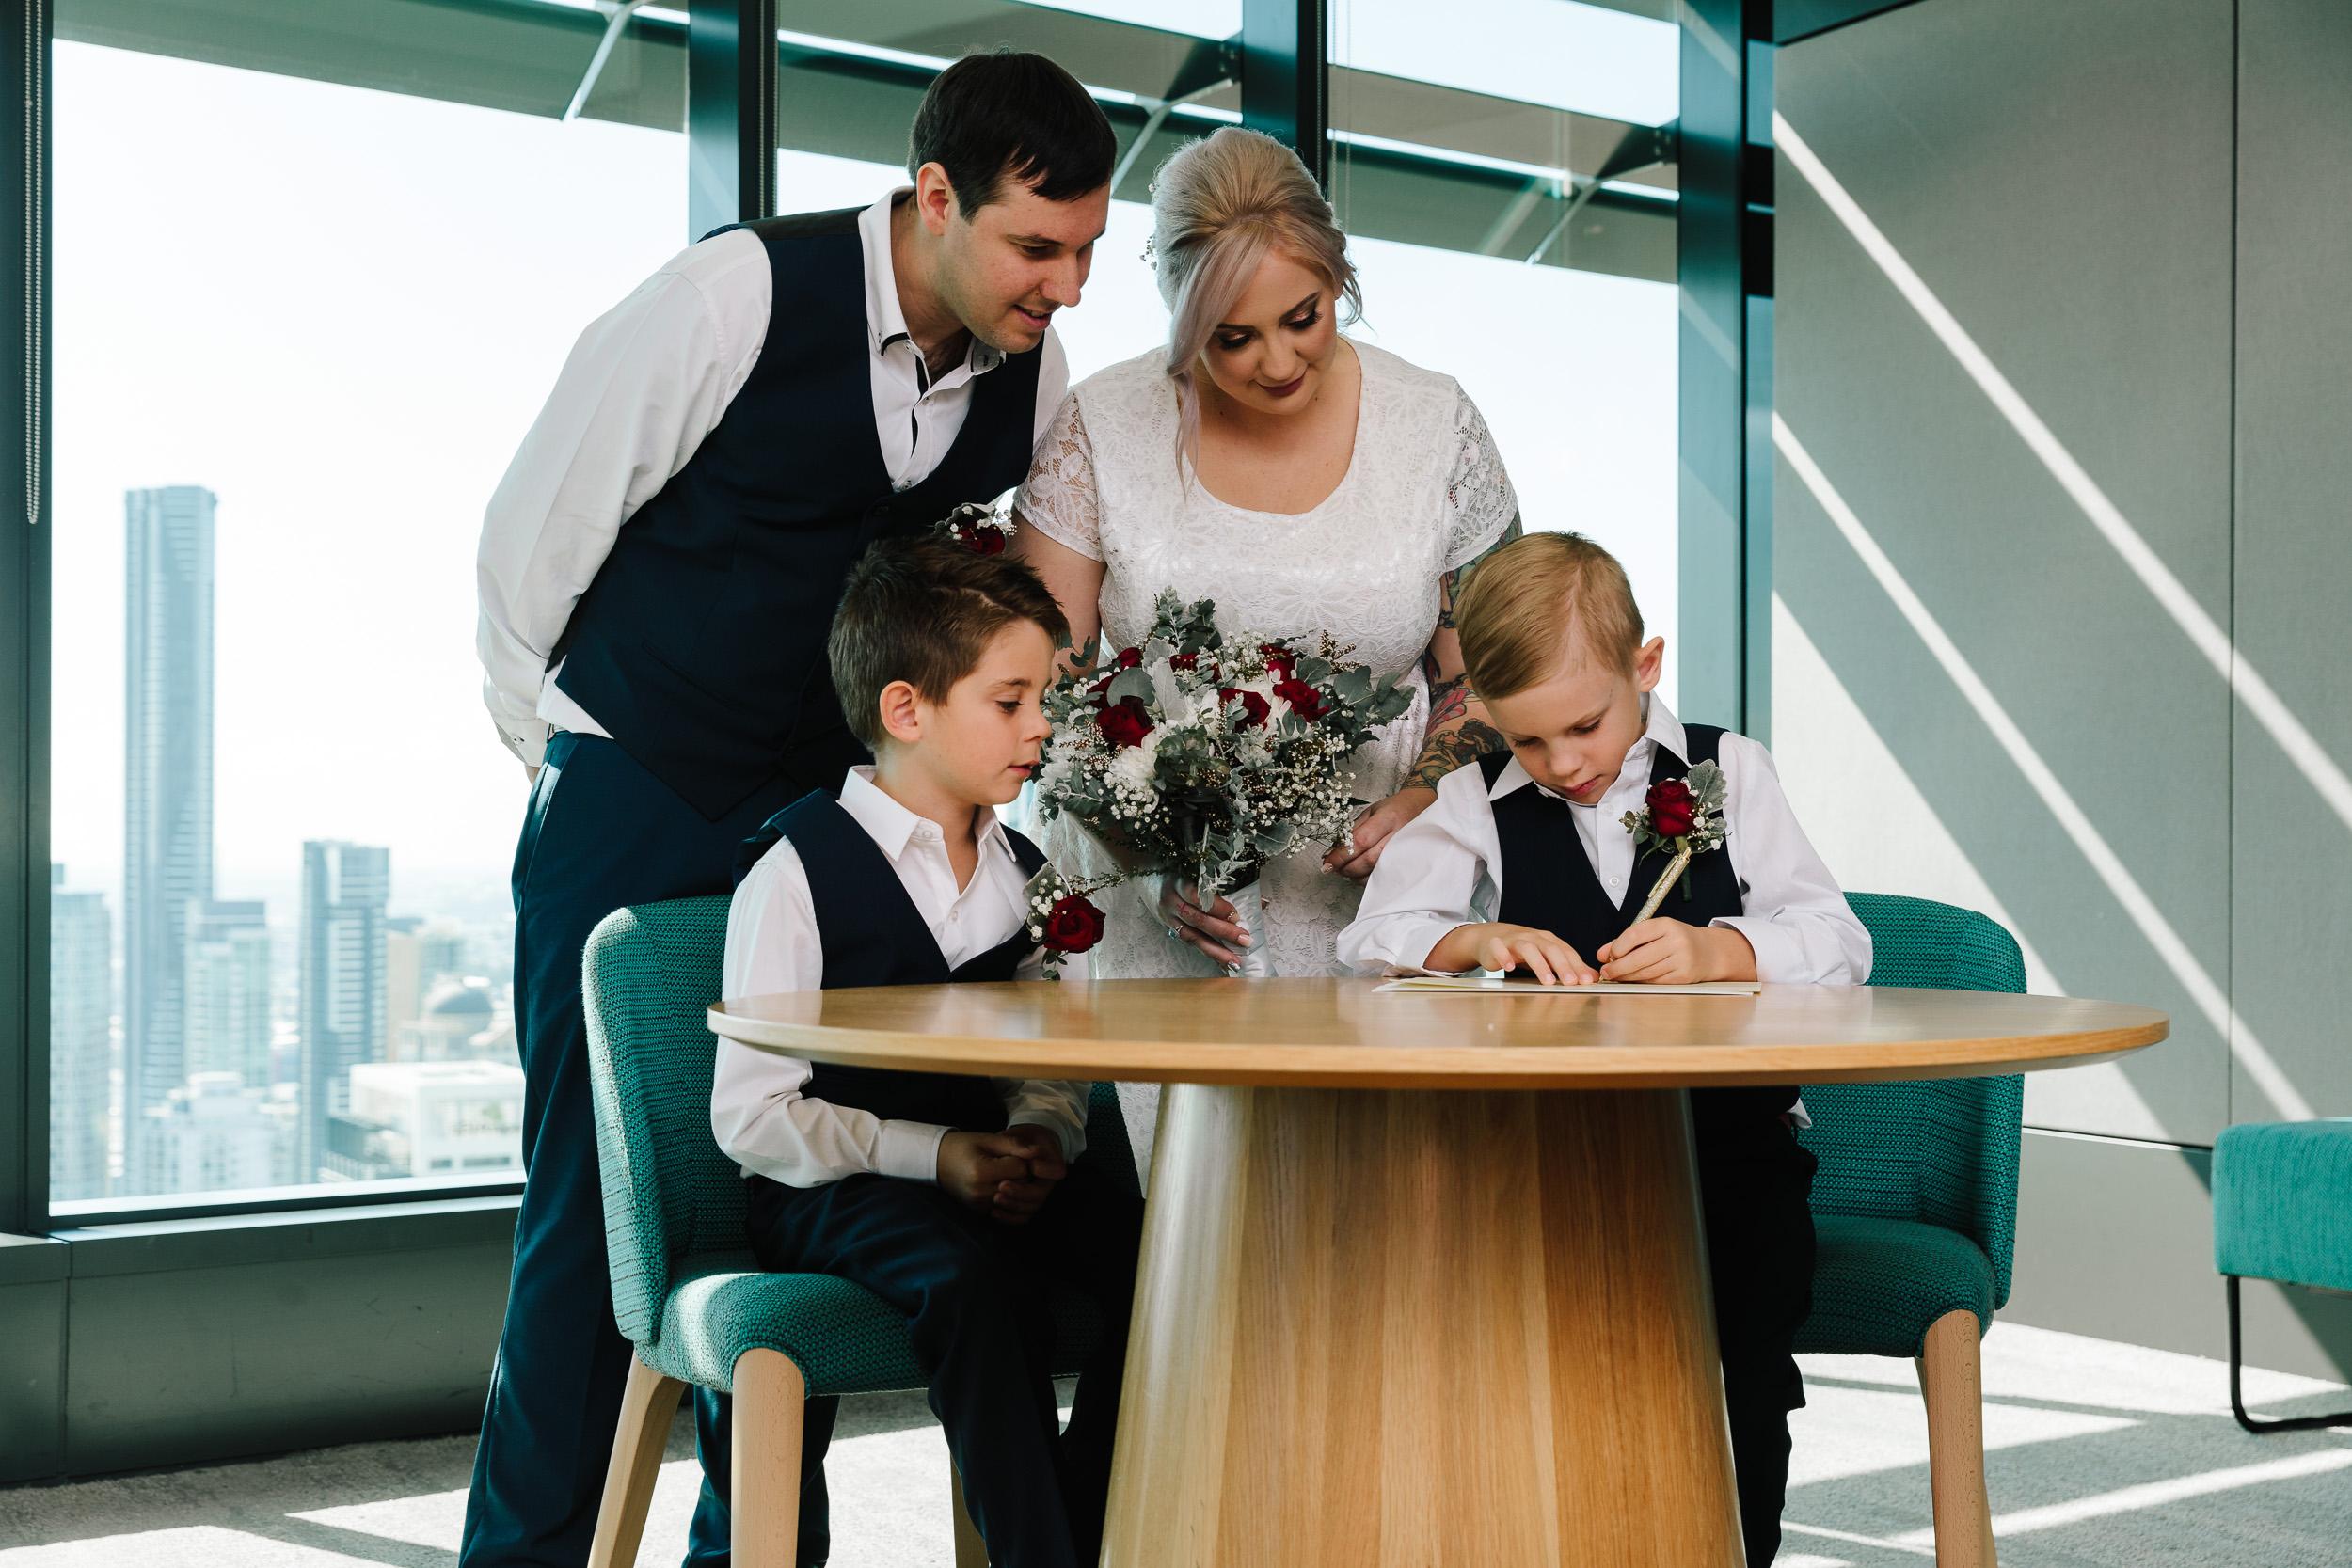 brisbane-wedding-registry-photos-ceremony-room-1-2.jpg